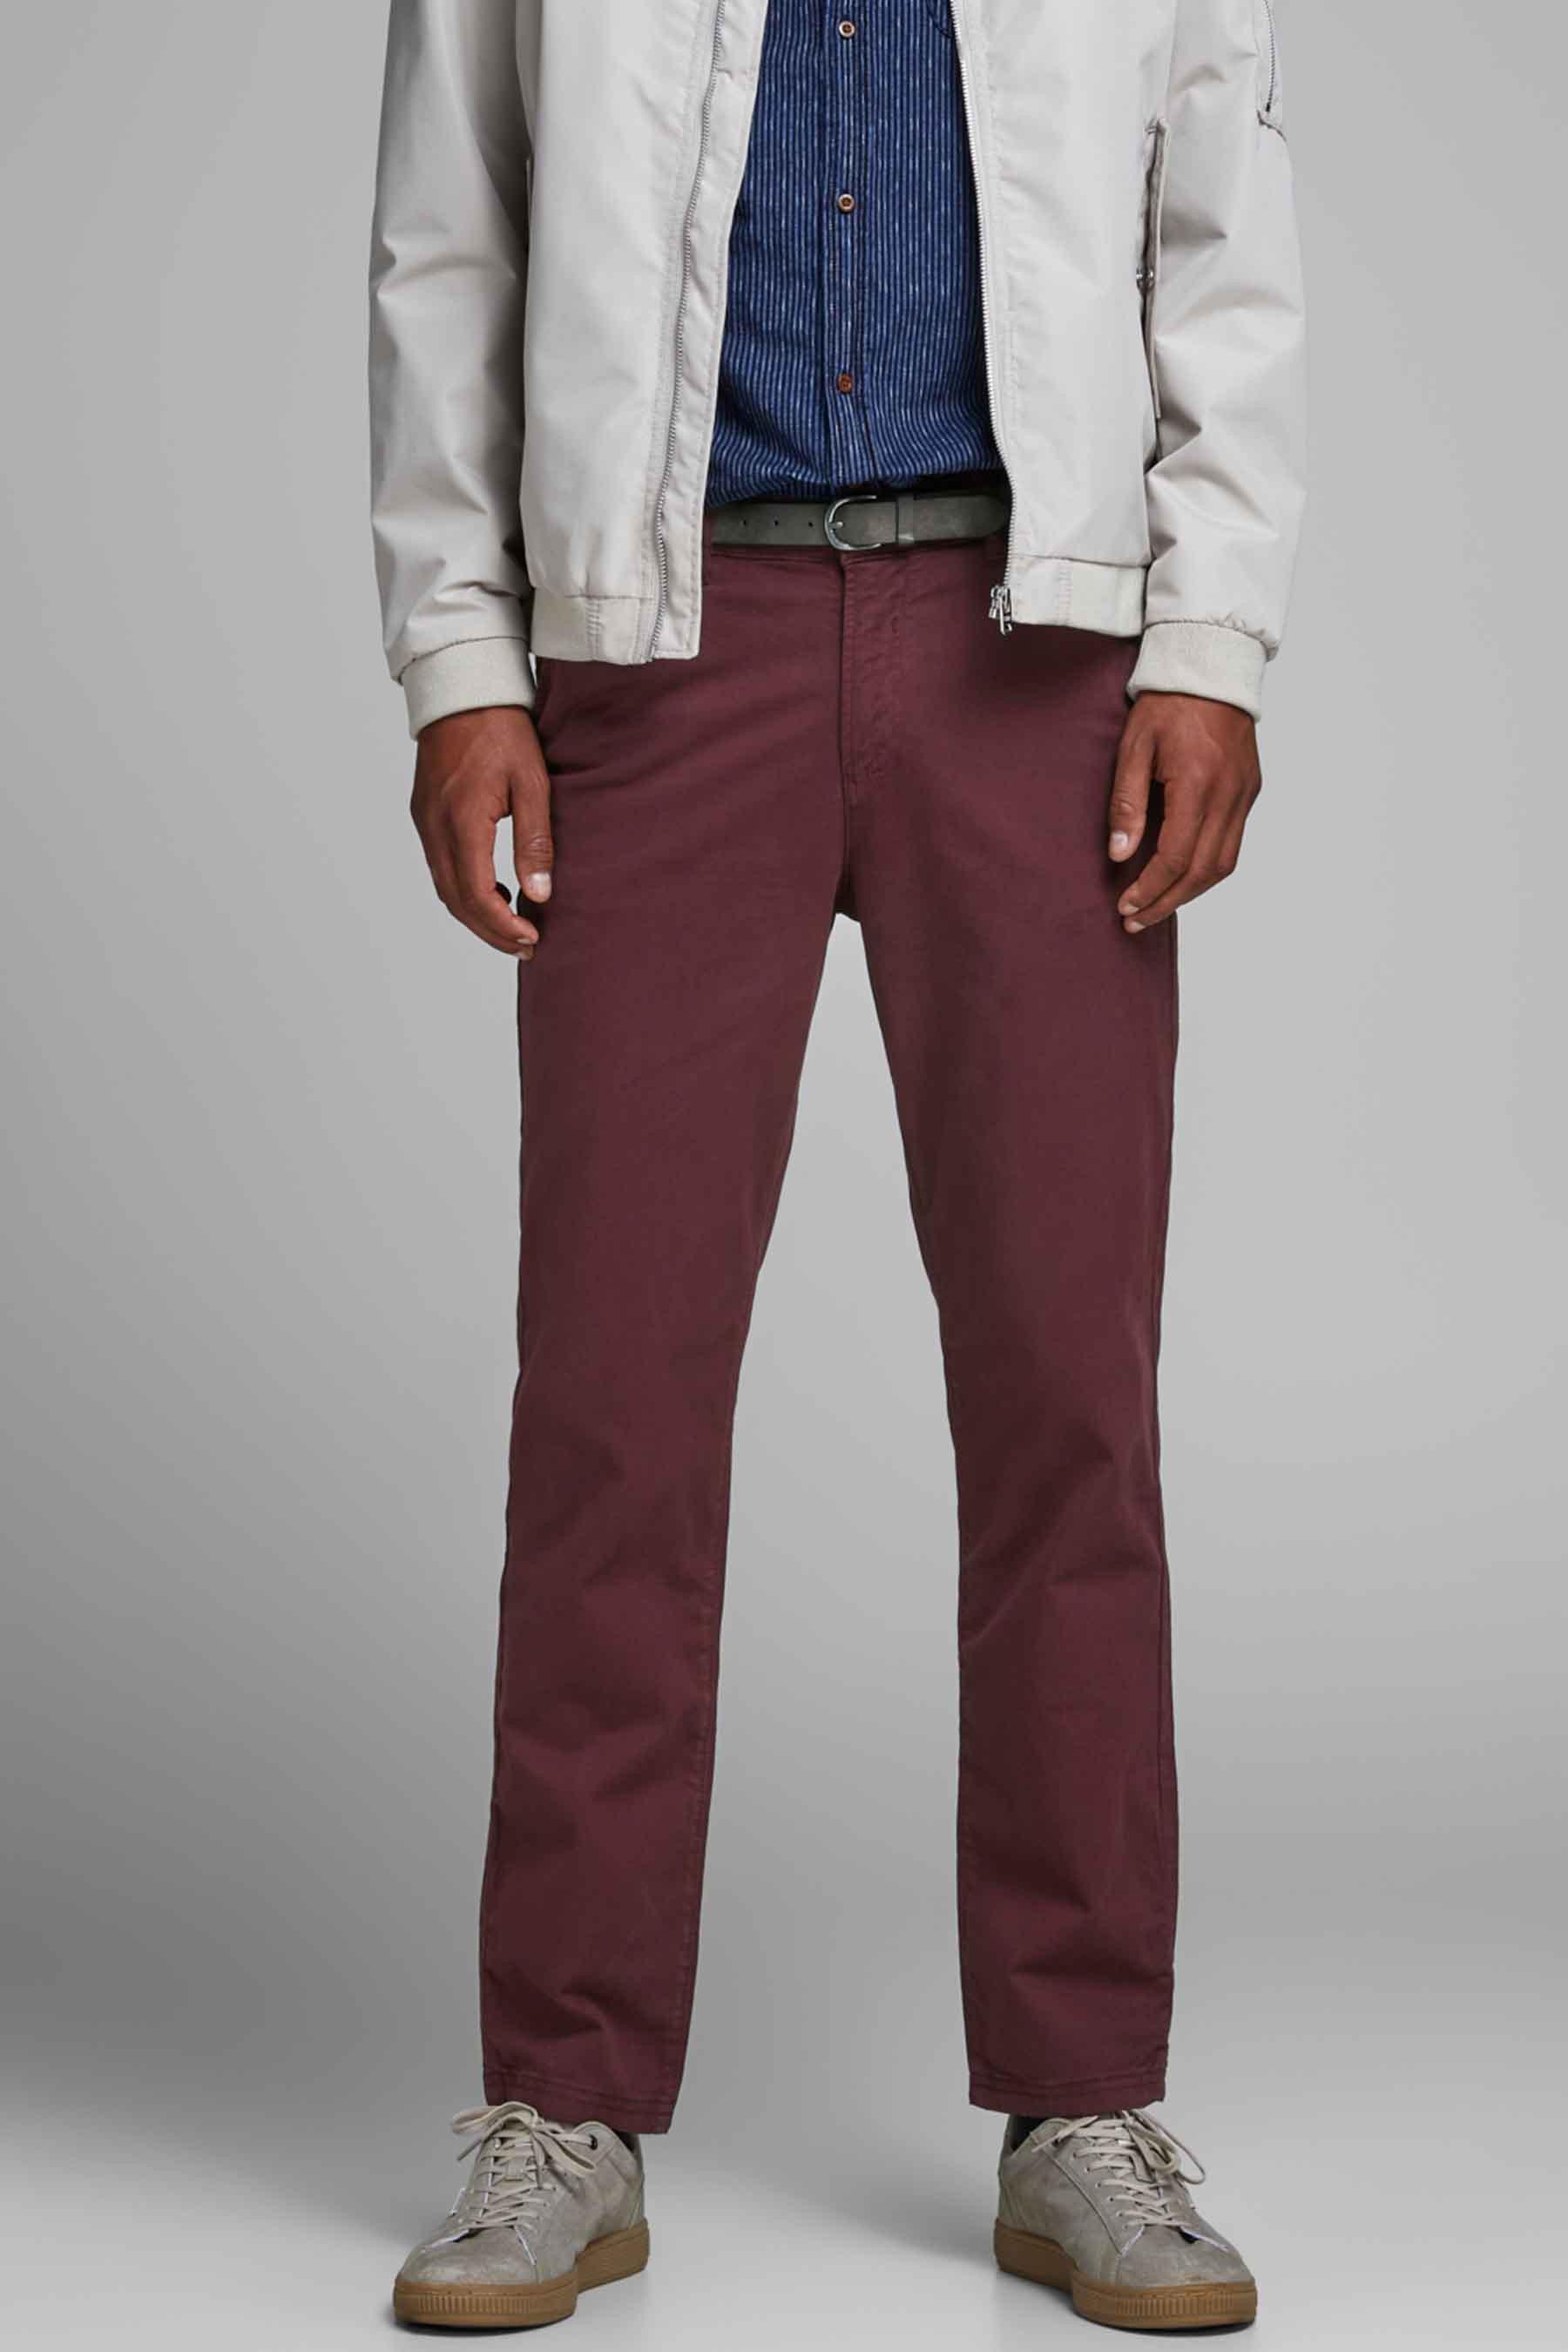 Jack & Jones Jeans Intelligenc Chino, Rood, Heren, Maat: 28x32/29x32/29x34/30x32